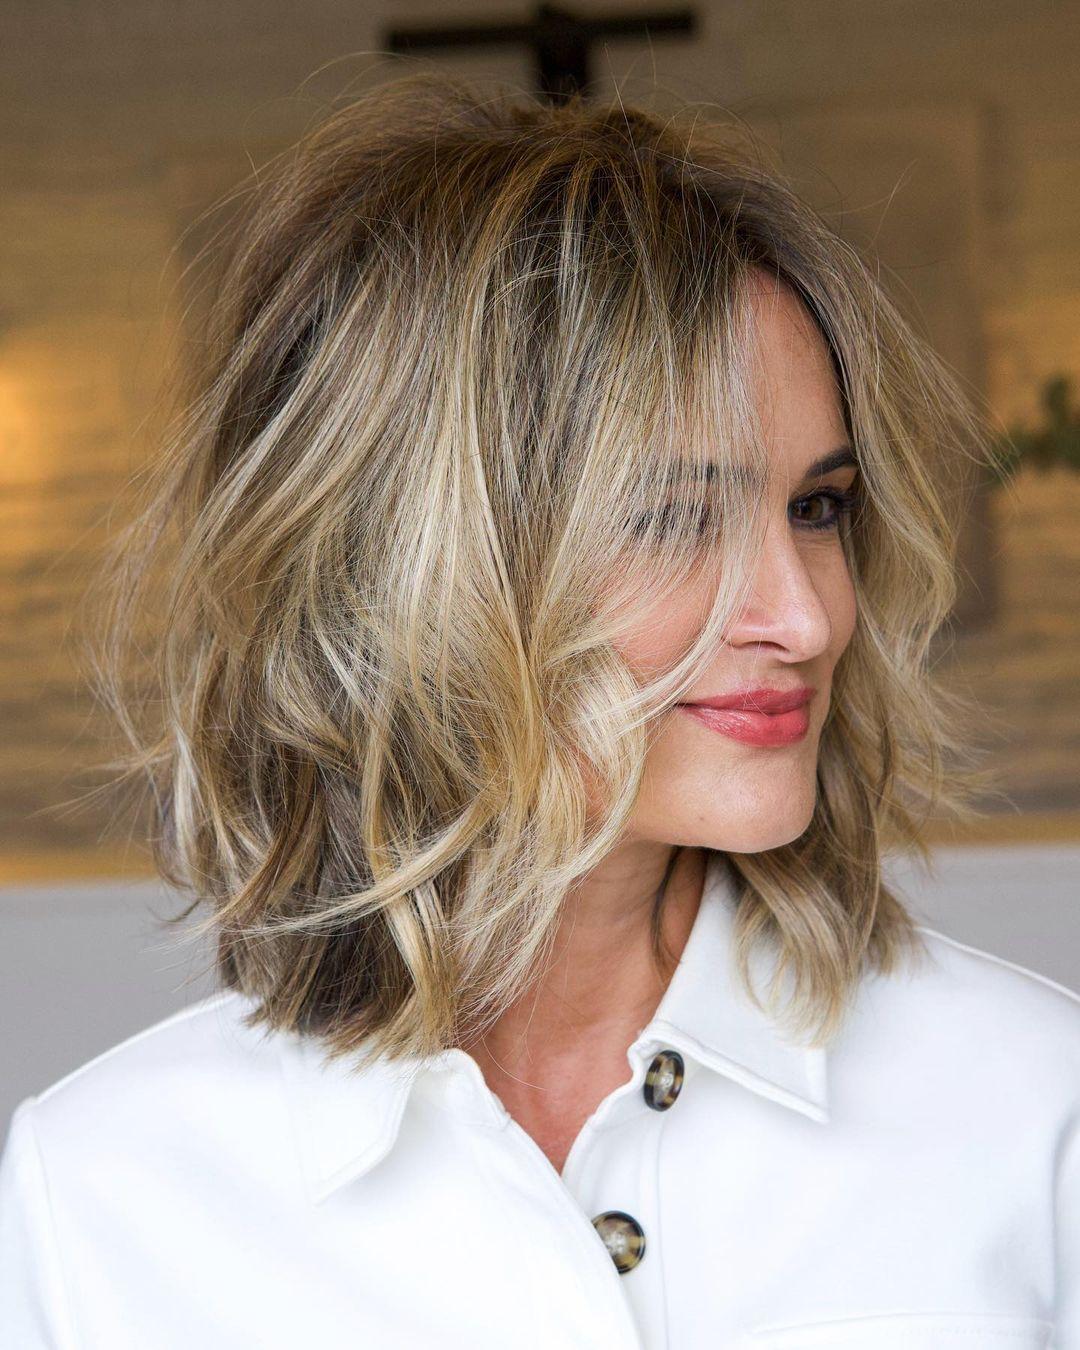 Pretty Short Wavy Hairstyles - Women Wavy Haircuts for Short Hair